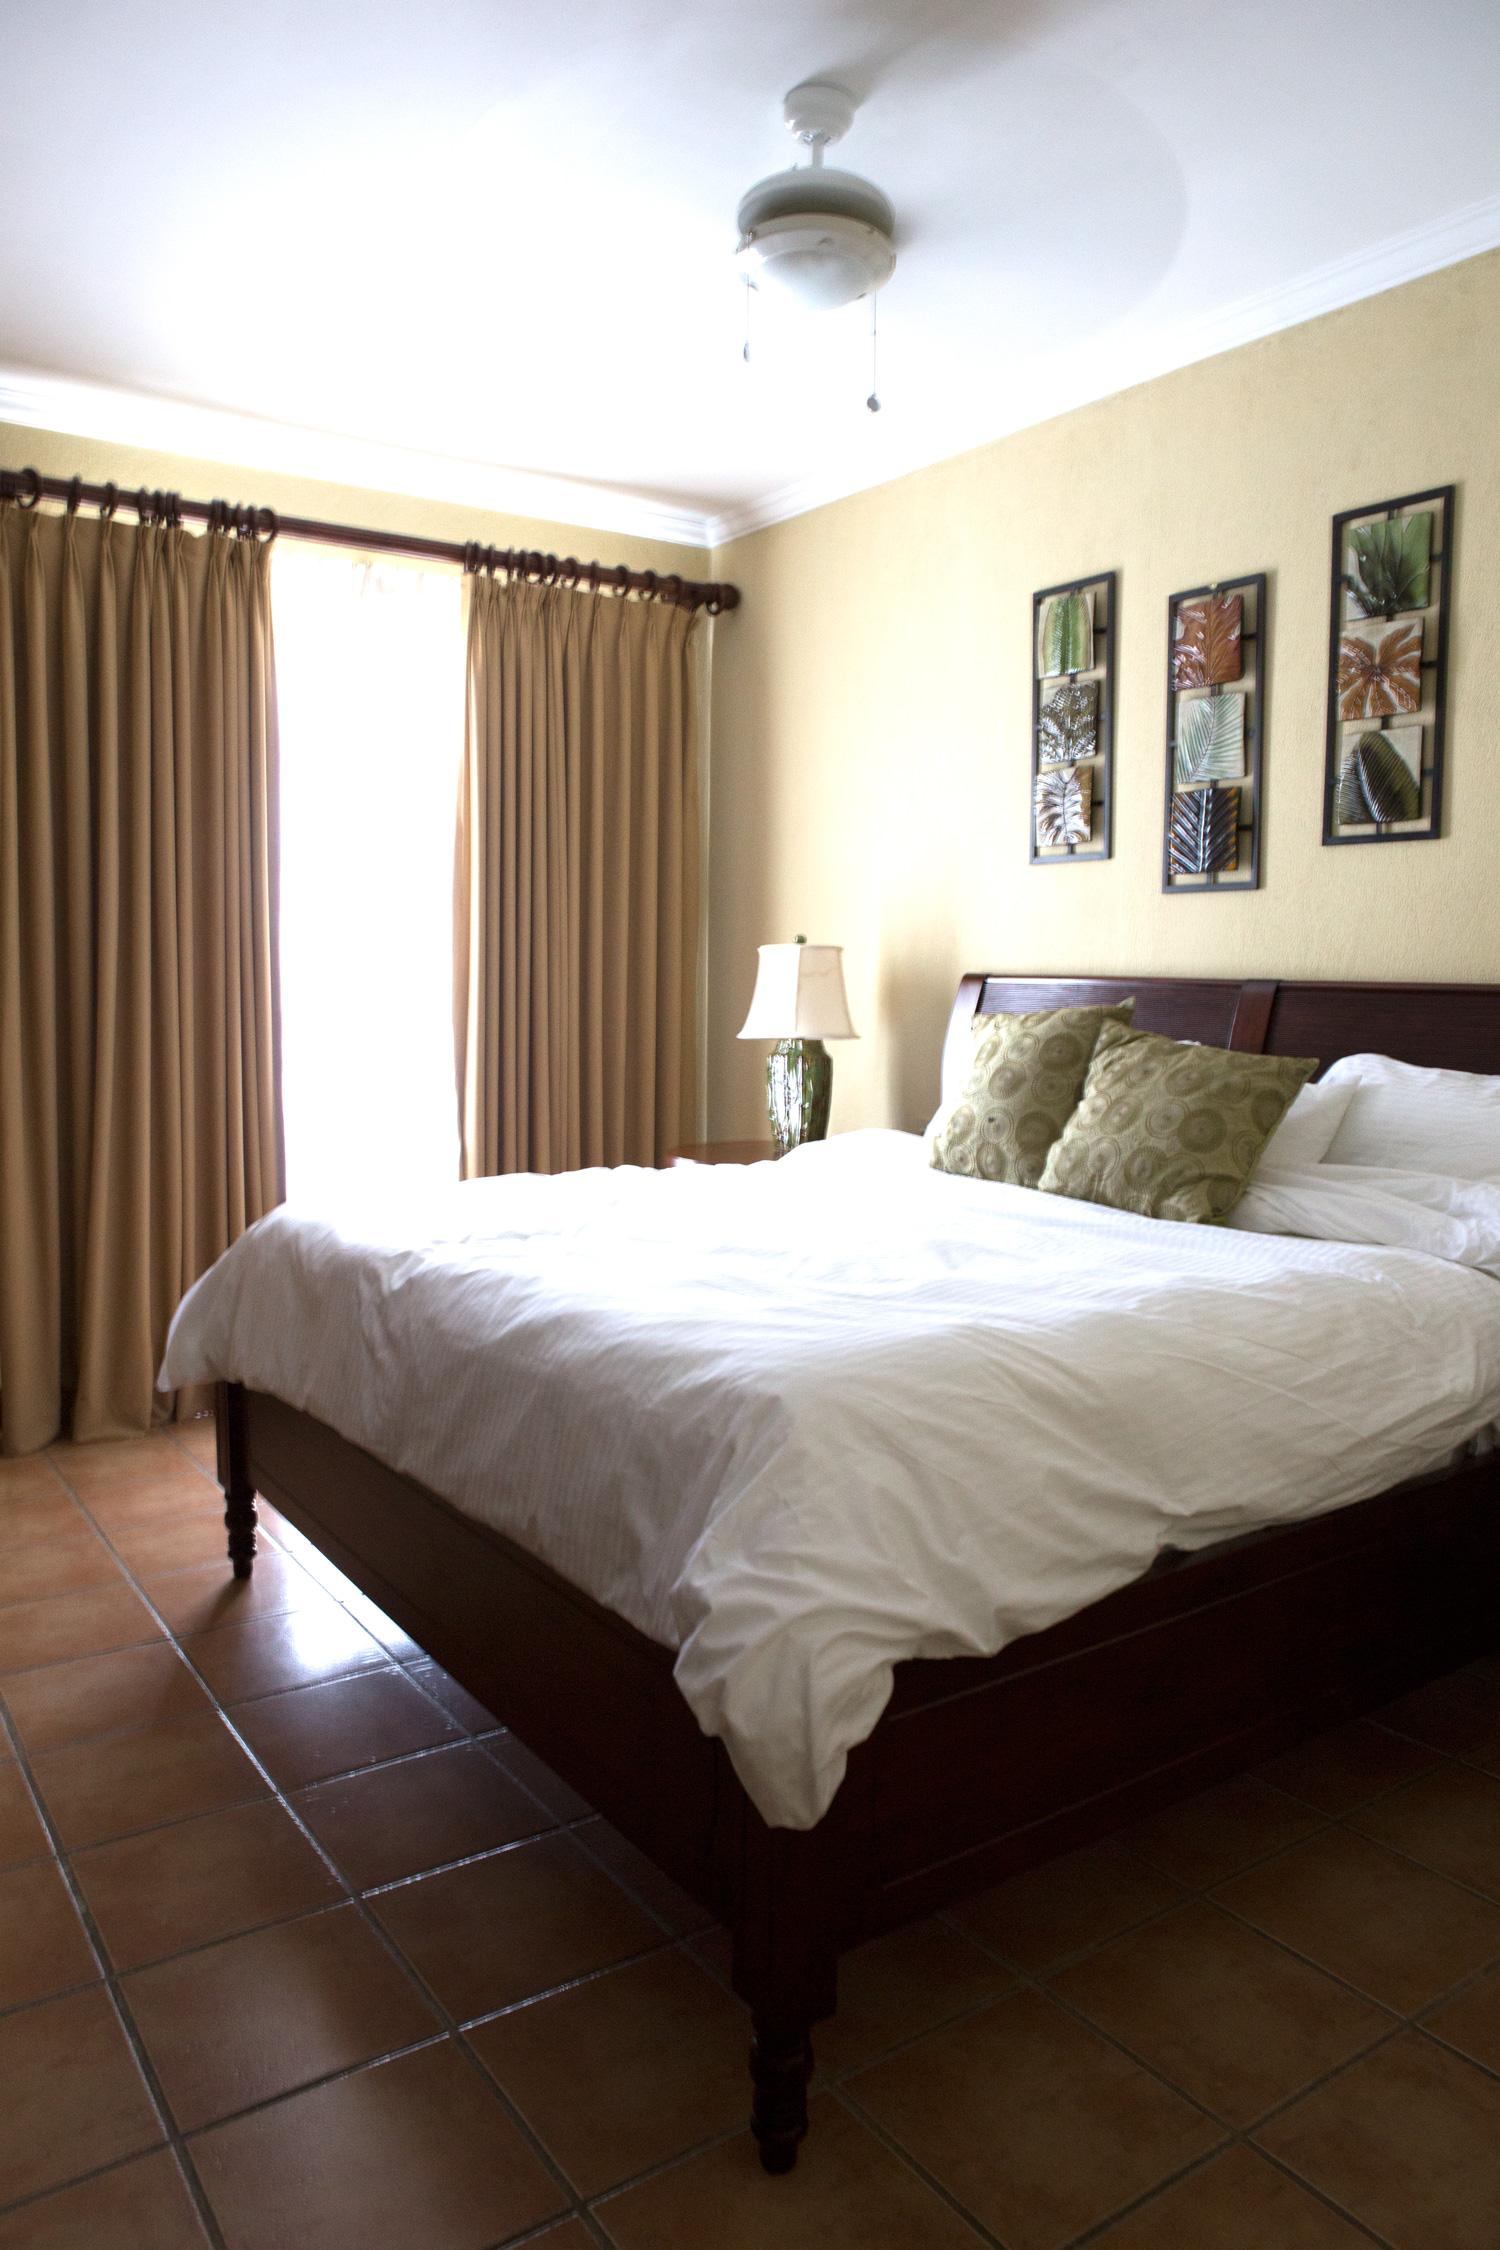 Master Bedroom at Reserva Conchal, Costa Rica